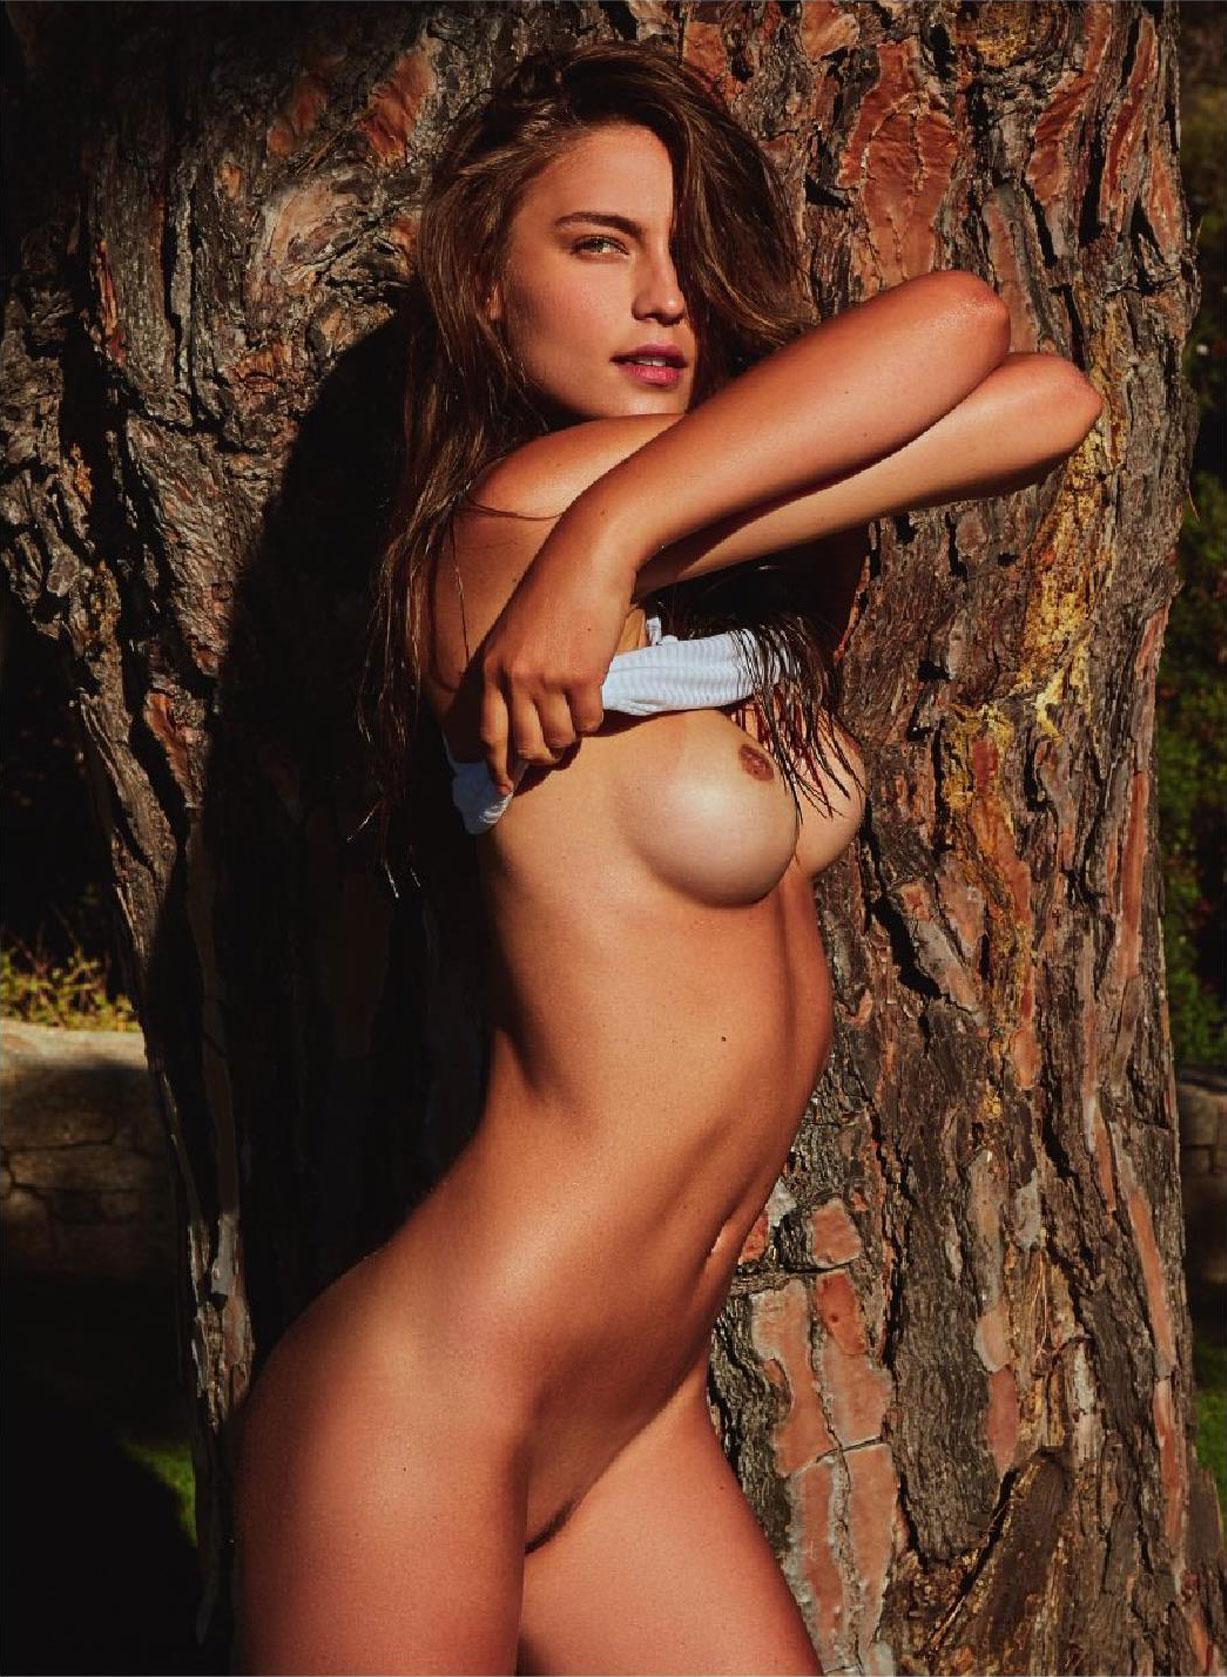 Фернанда Лиз в журнале Lui september 2016 / Fernanda Liz nude by Fe Pinheiro